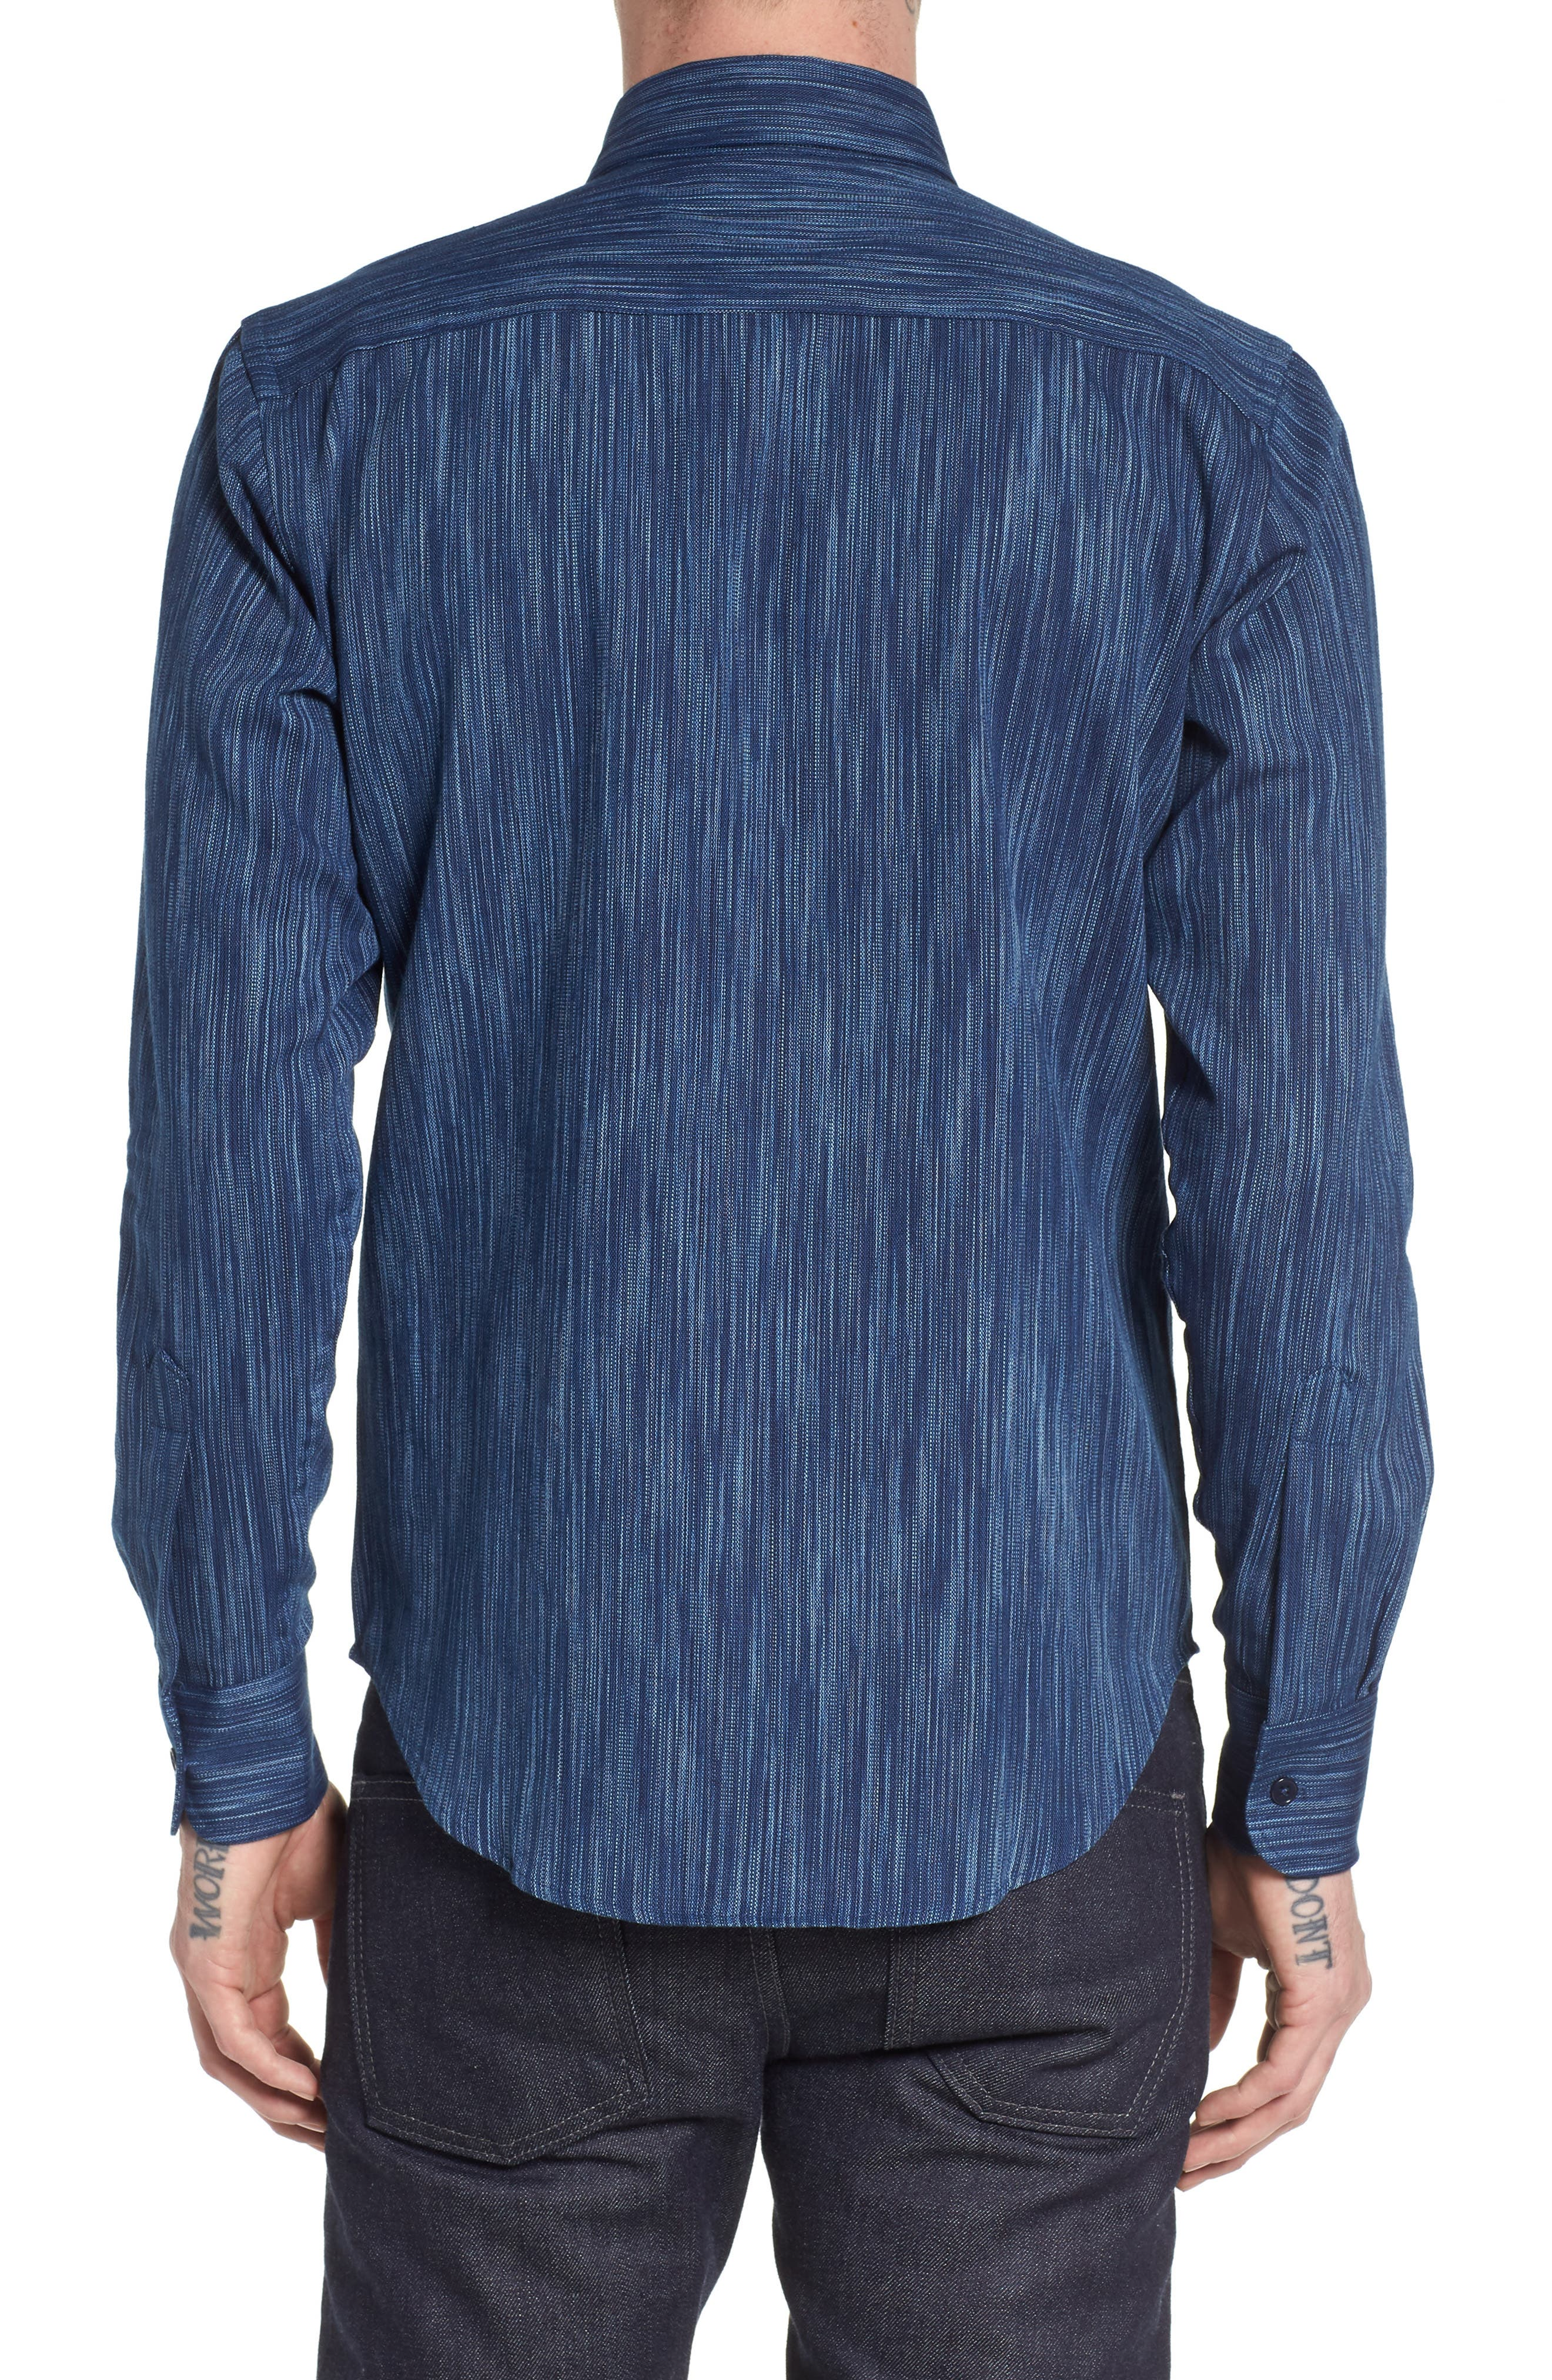 Indigo Tie Dye Rain Weave Shirt,                             Alternate thumbnail 2, color,                             401